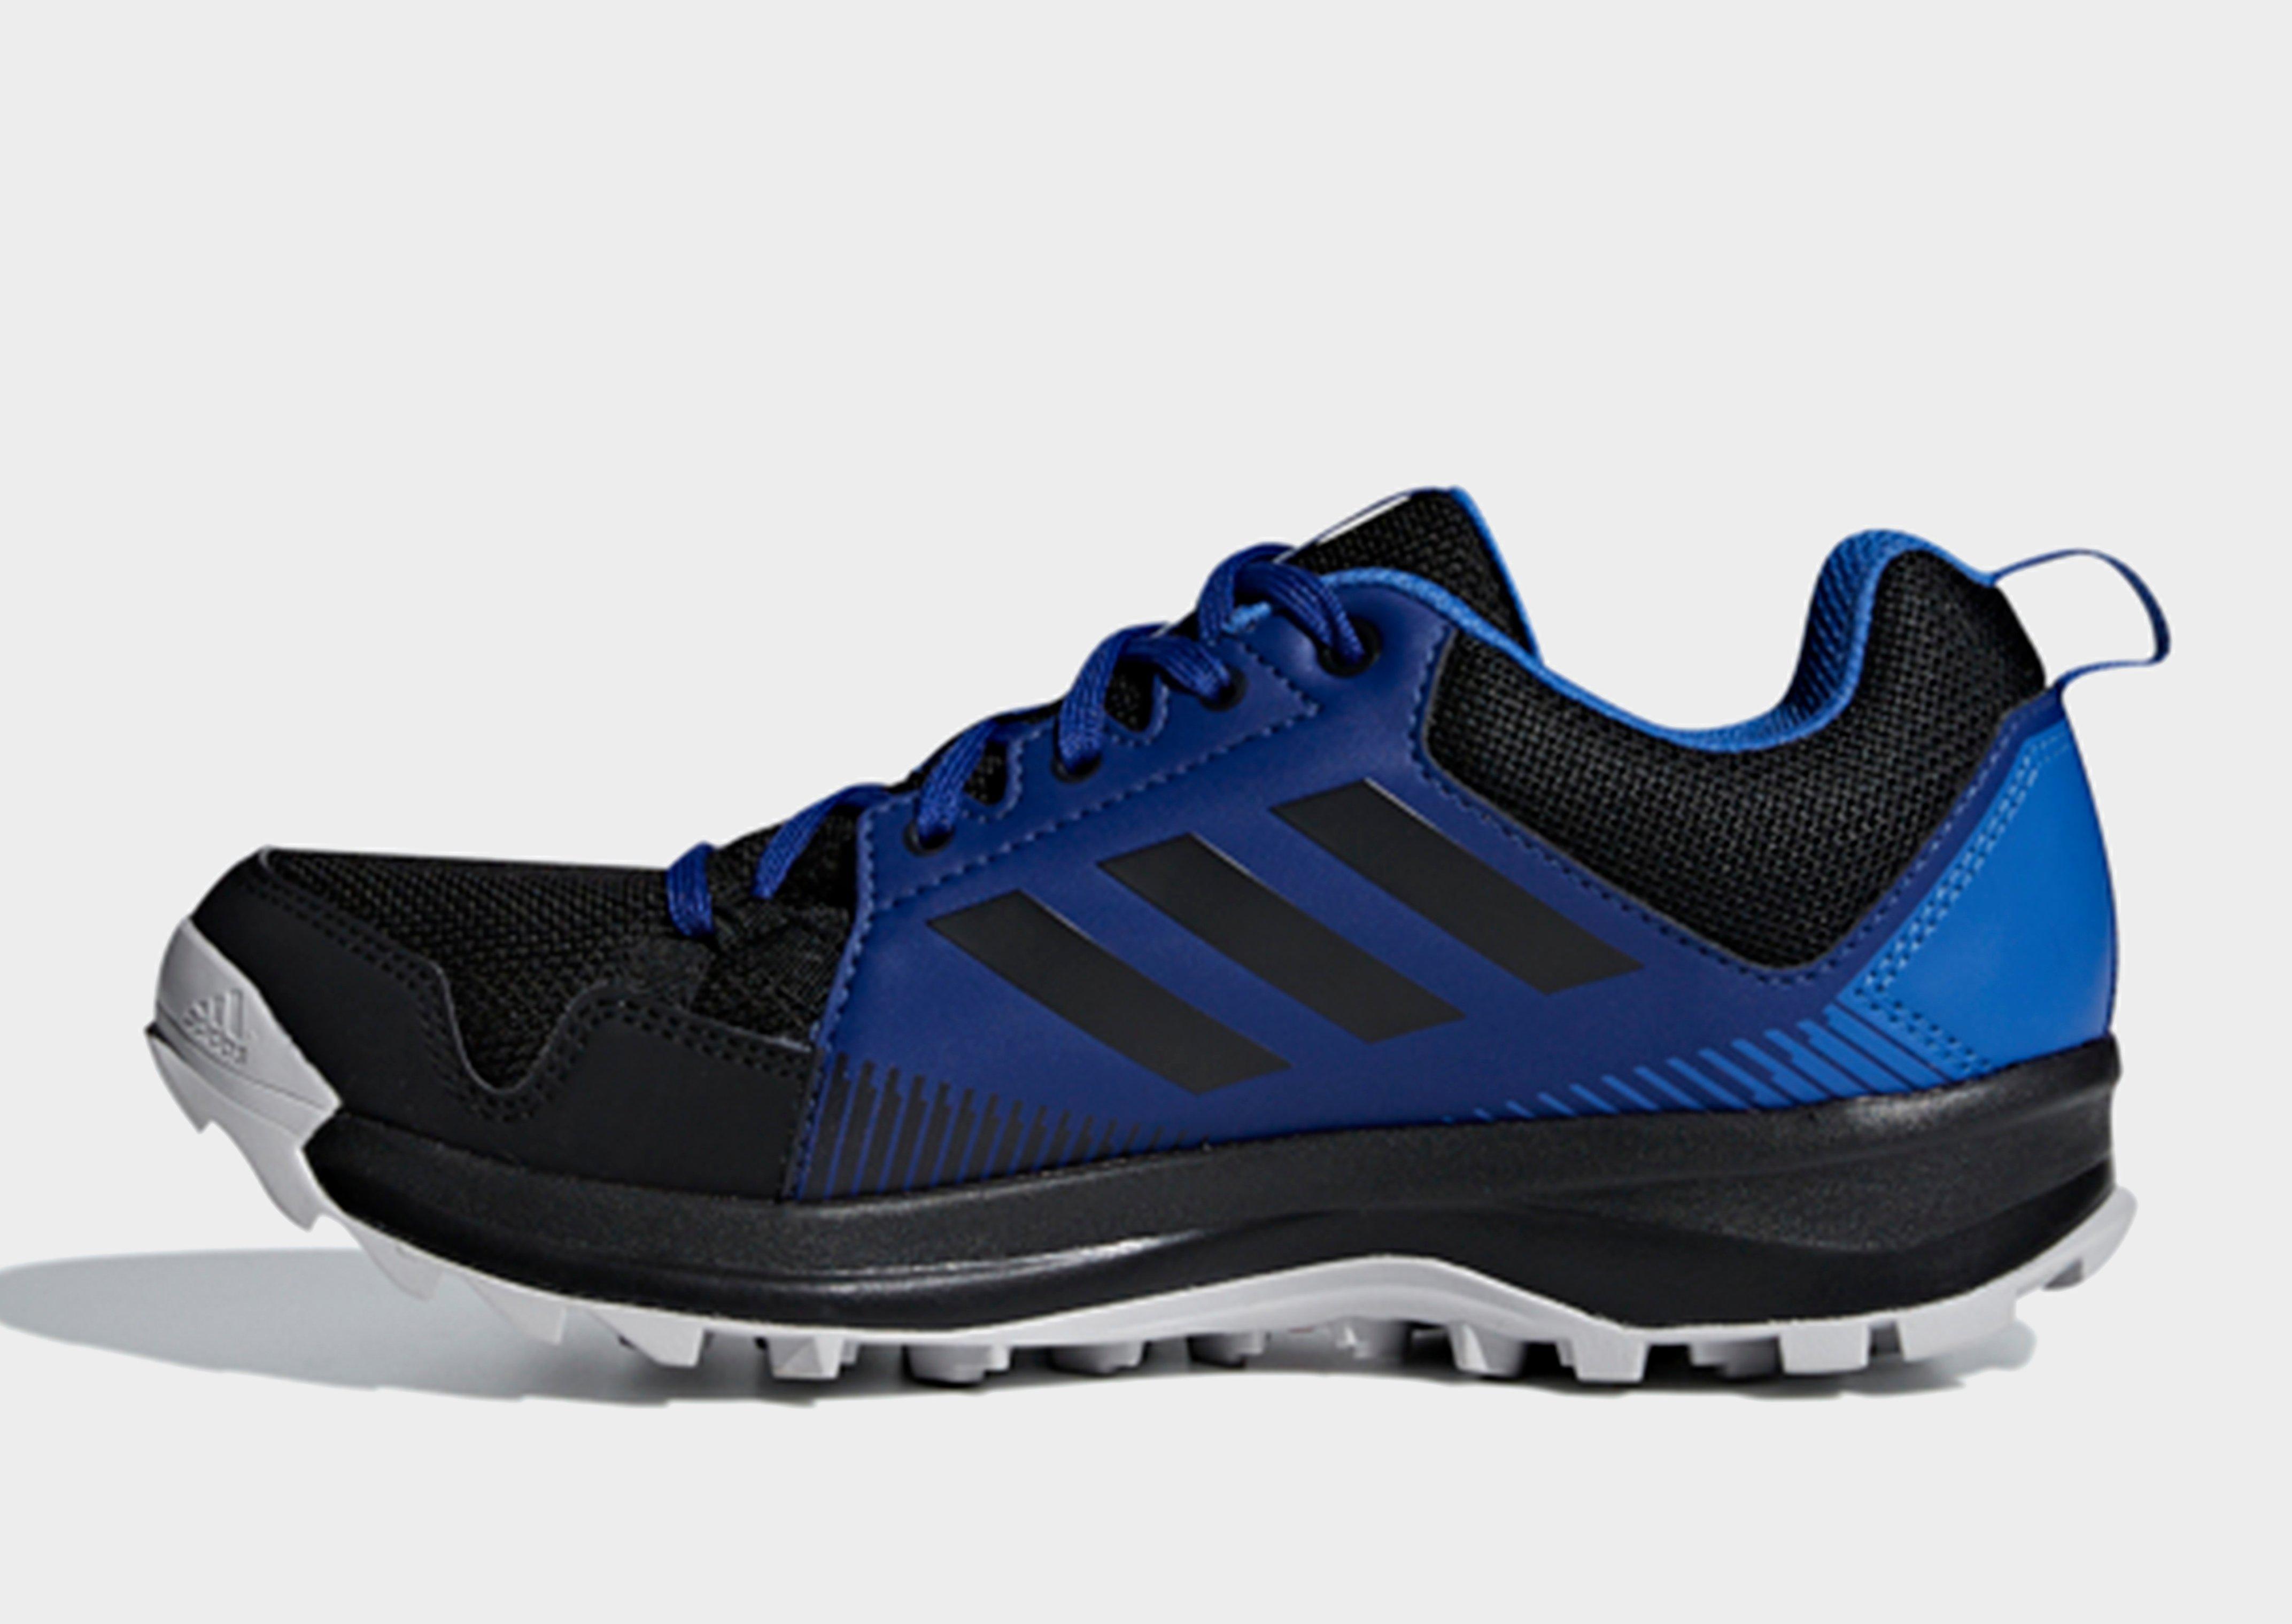 sports shoes 9f820 9129e Lyst - Adidas Terrex Tracerocker Gtx Shoes in Blue